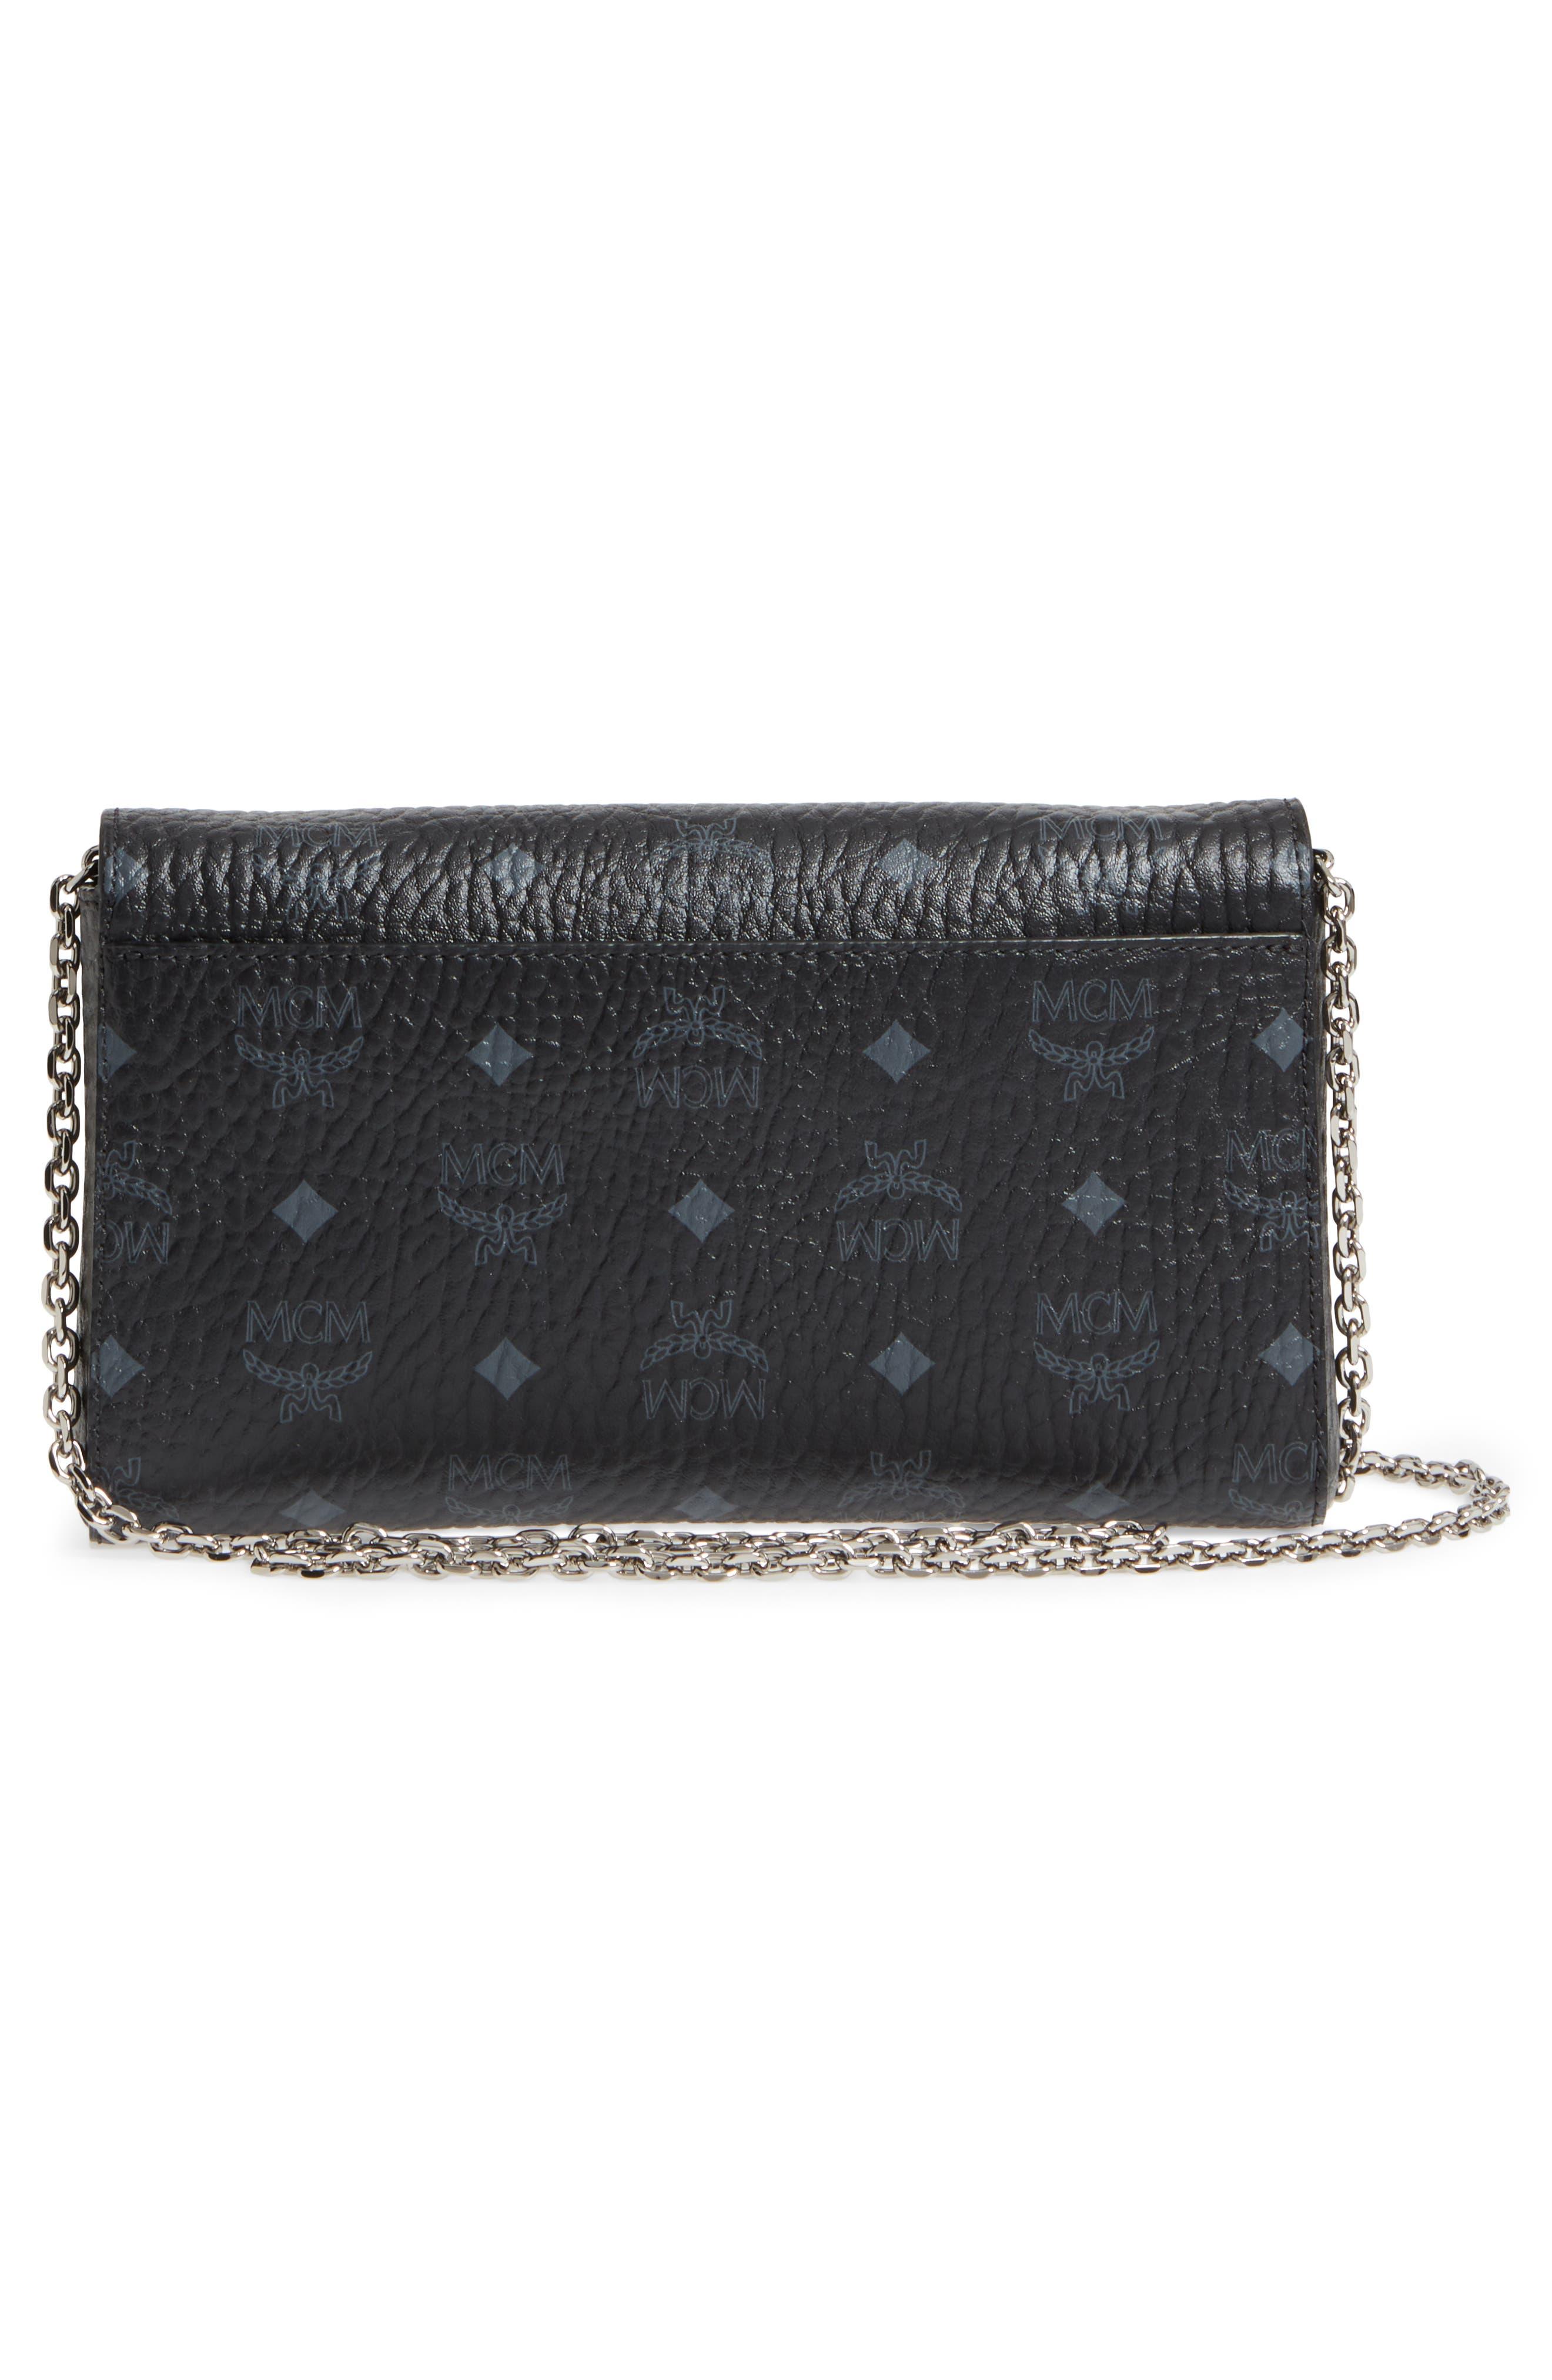 Millie Monogrammed Leather Crossbody Bag,                             Alternate thumbnail 3, color,                             001